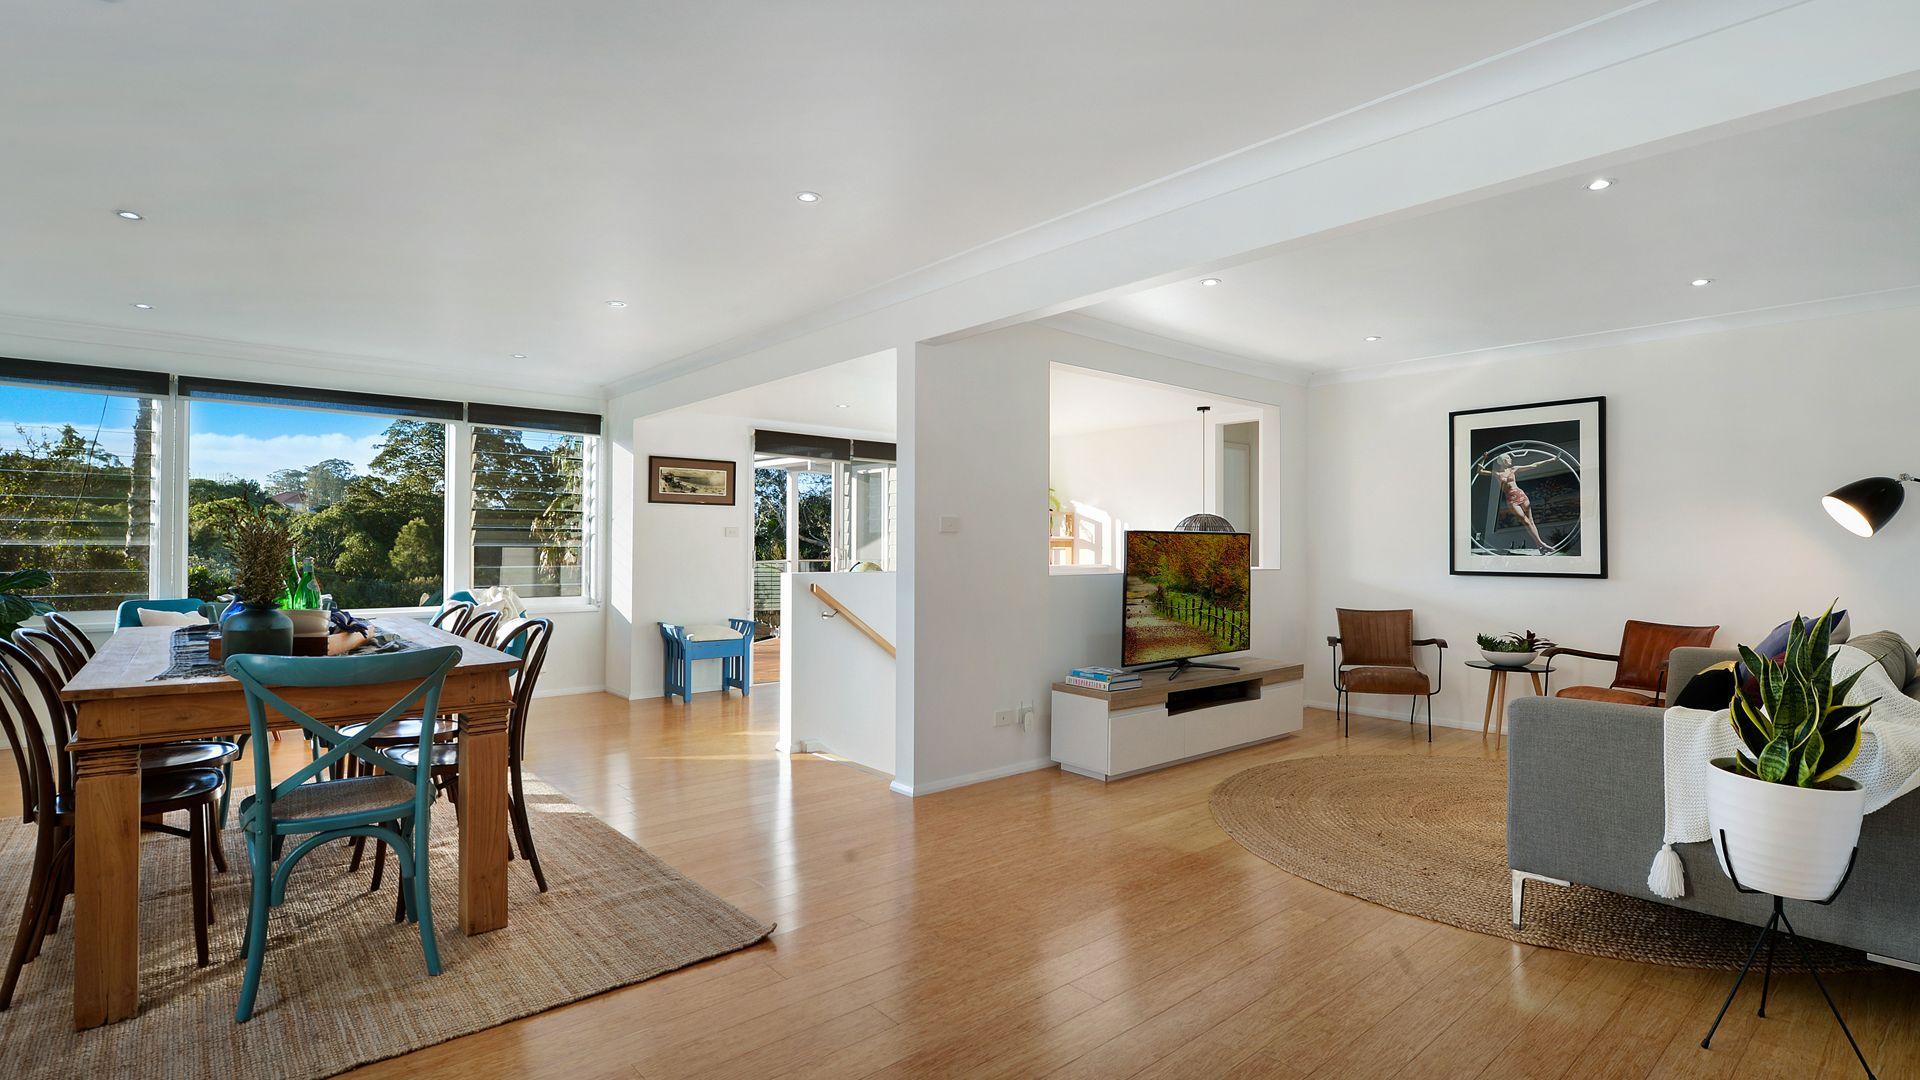 52 Girrawheen Avenue, Kiama NSW 2533, Image 2